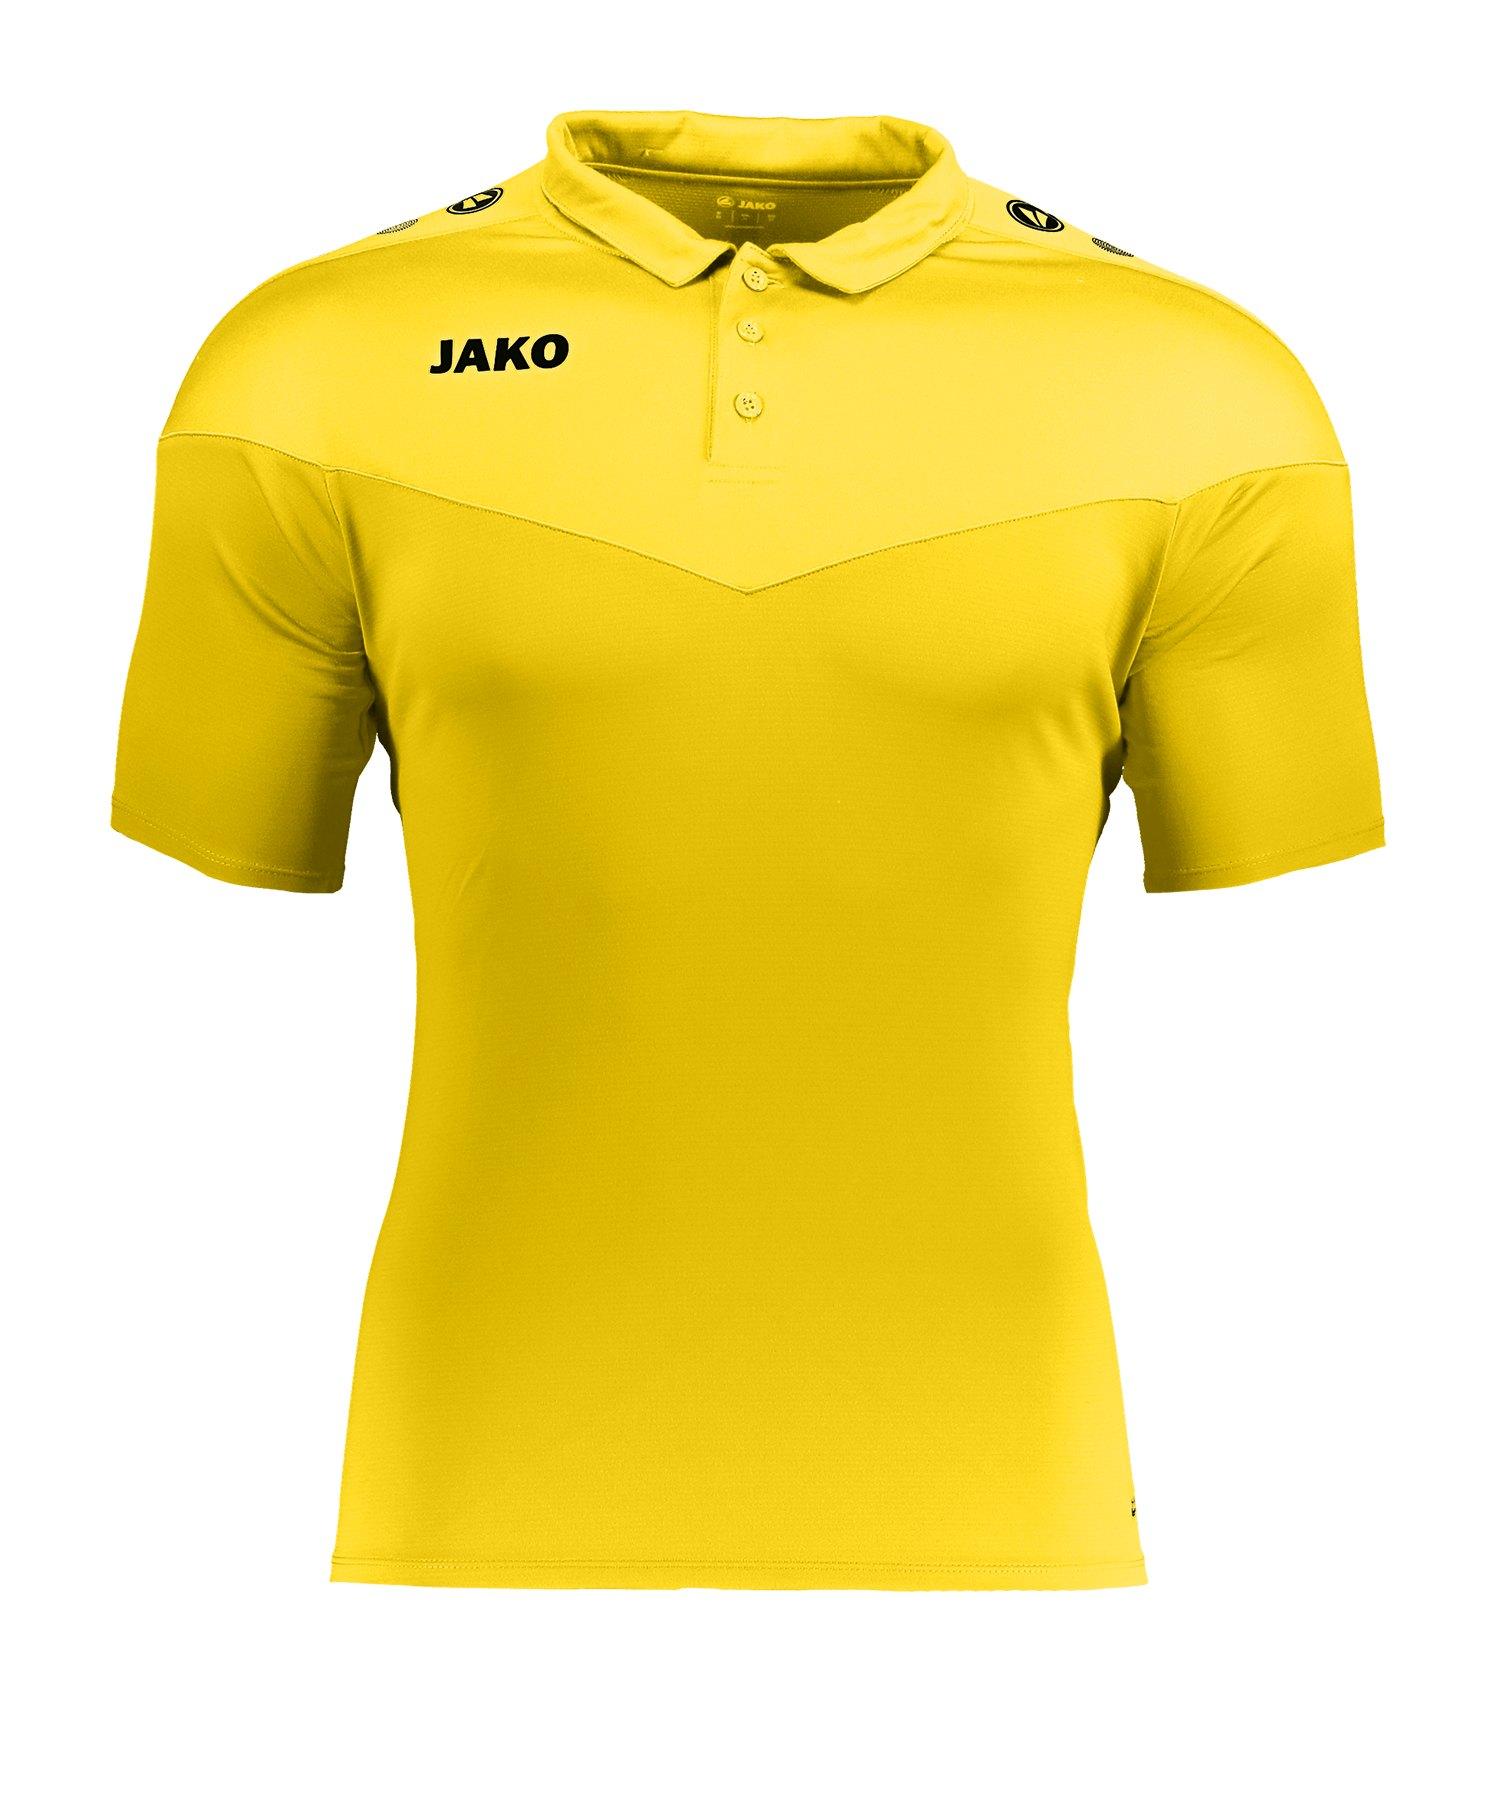 Jako Champ 2.0 Poloshirt Damen Gelb F03 - gelb